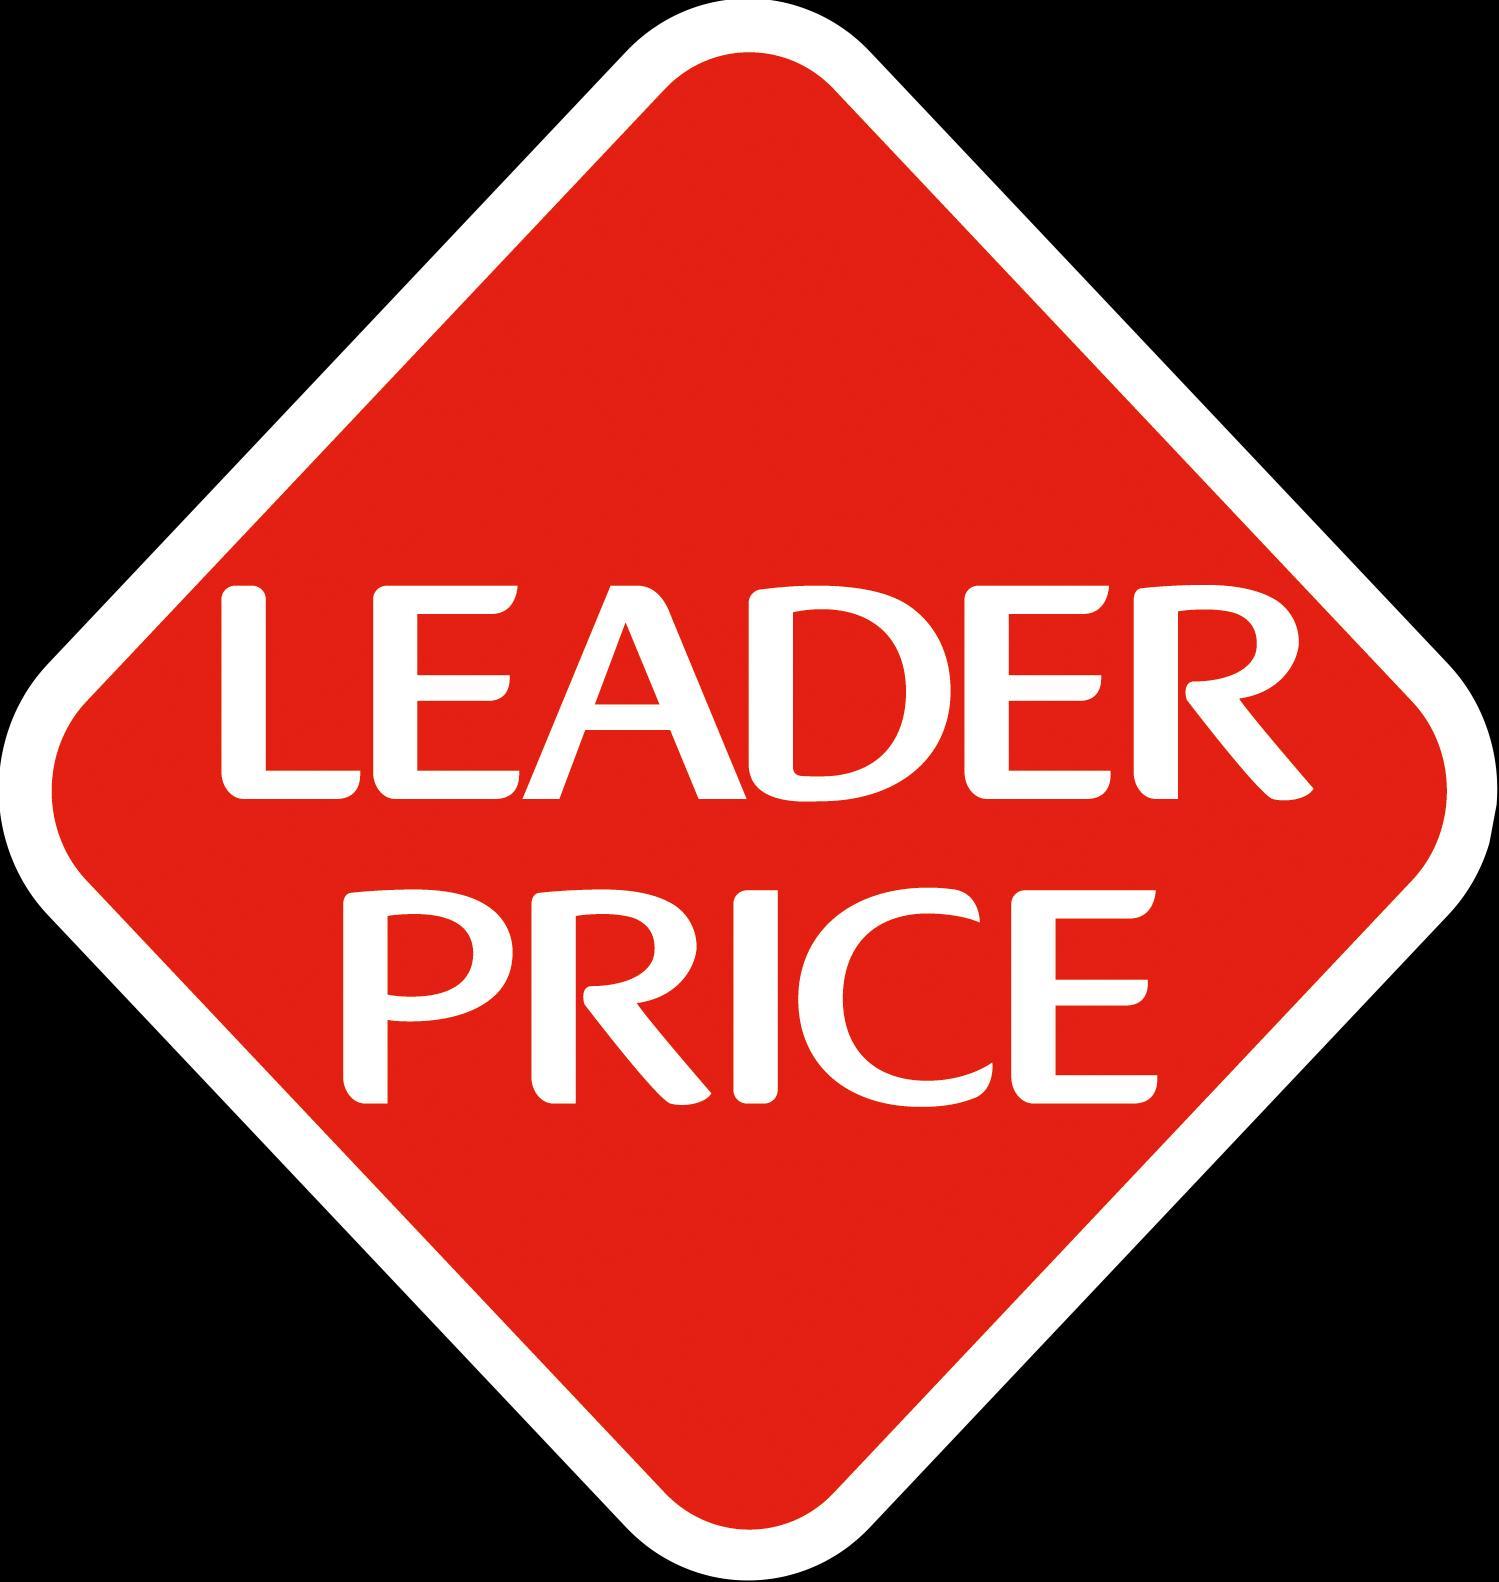 Leader Price Saint Paul